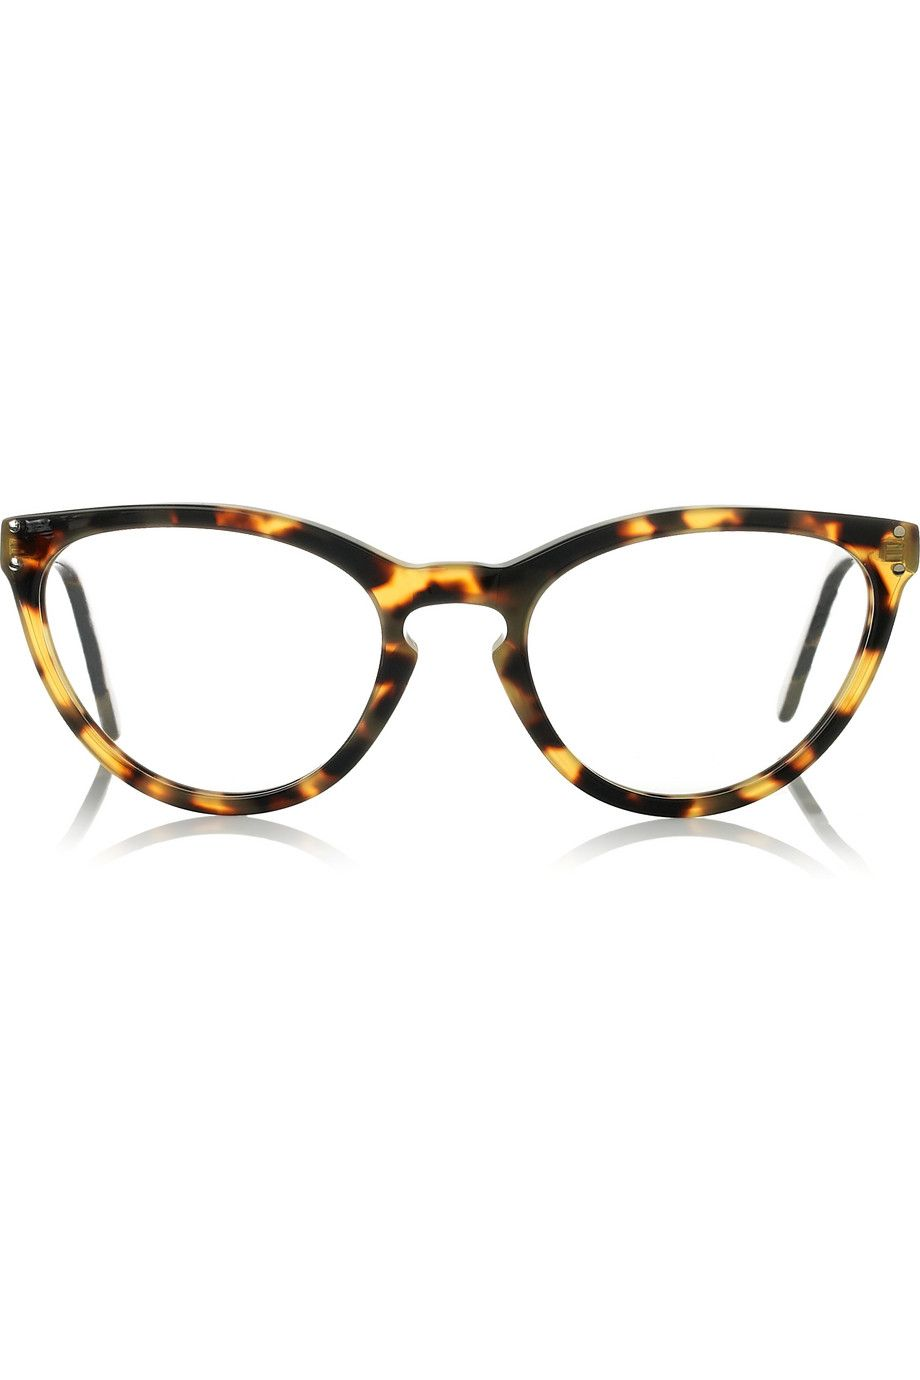 Selima Optique  Jessica cat eye-frame acetate optical glasses